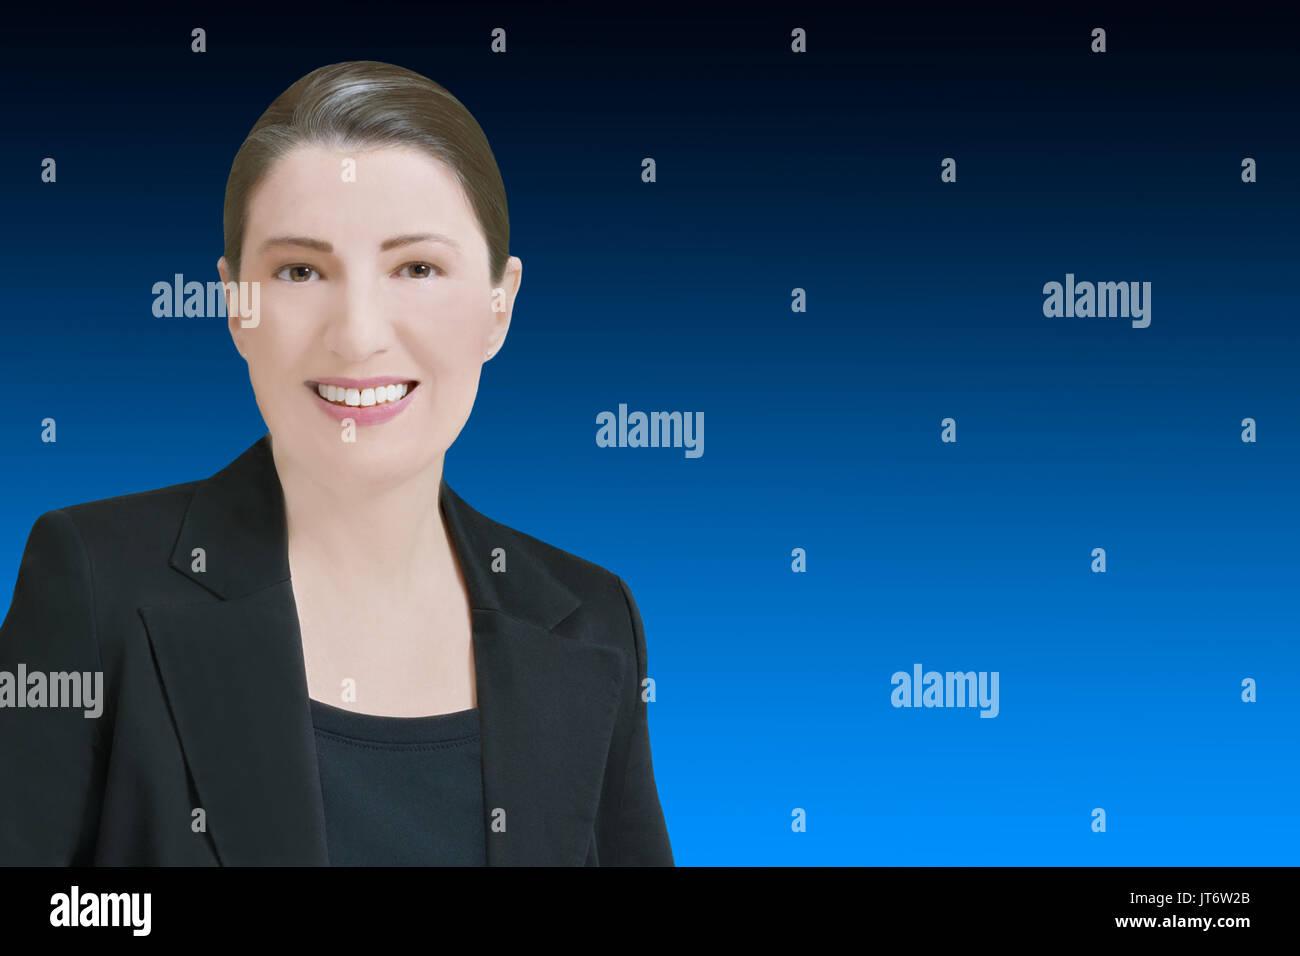 Robo-hembra advisor o chat concepto bot plantilla sonriente, amable mujer generados por ordenador en frente del Foto de stock